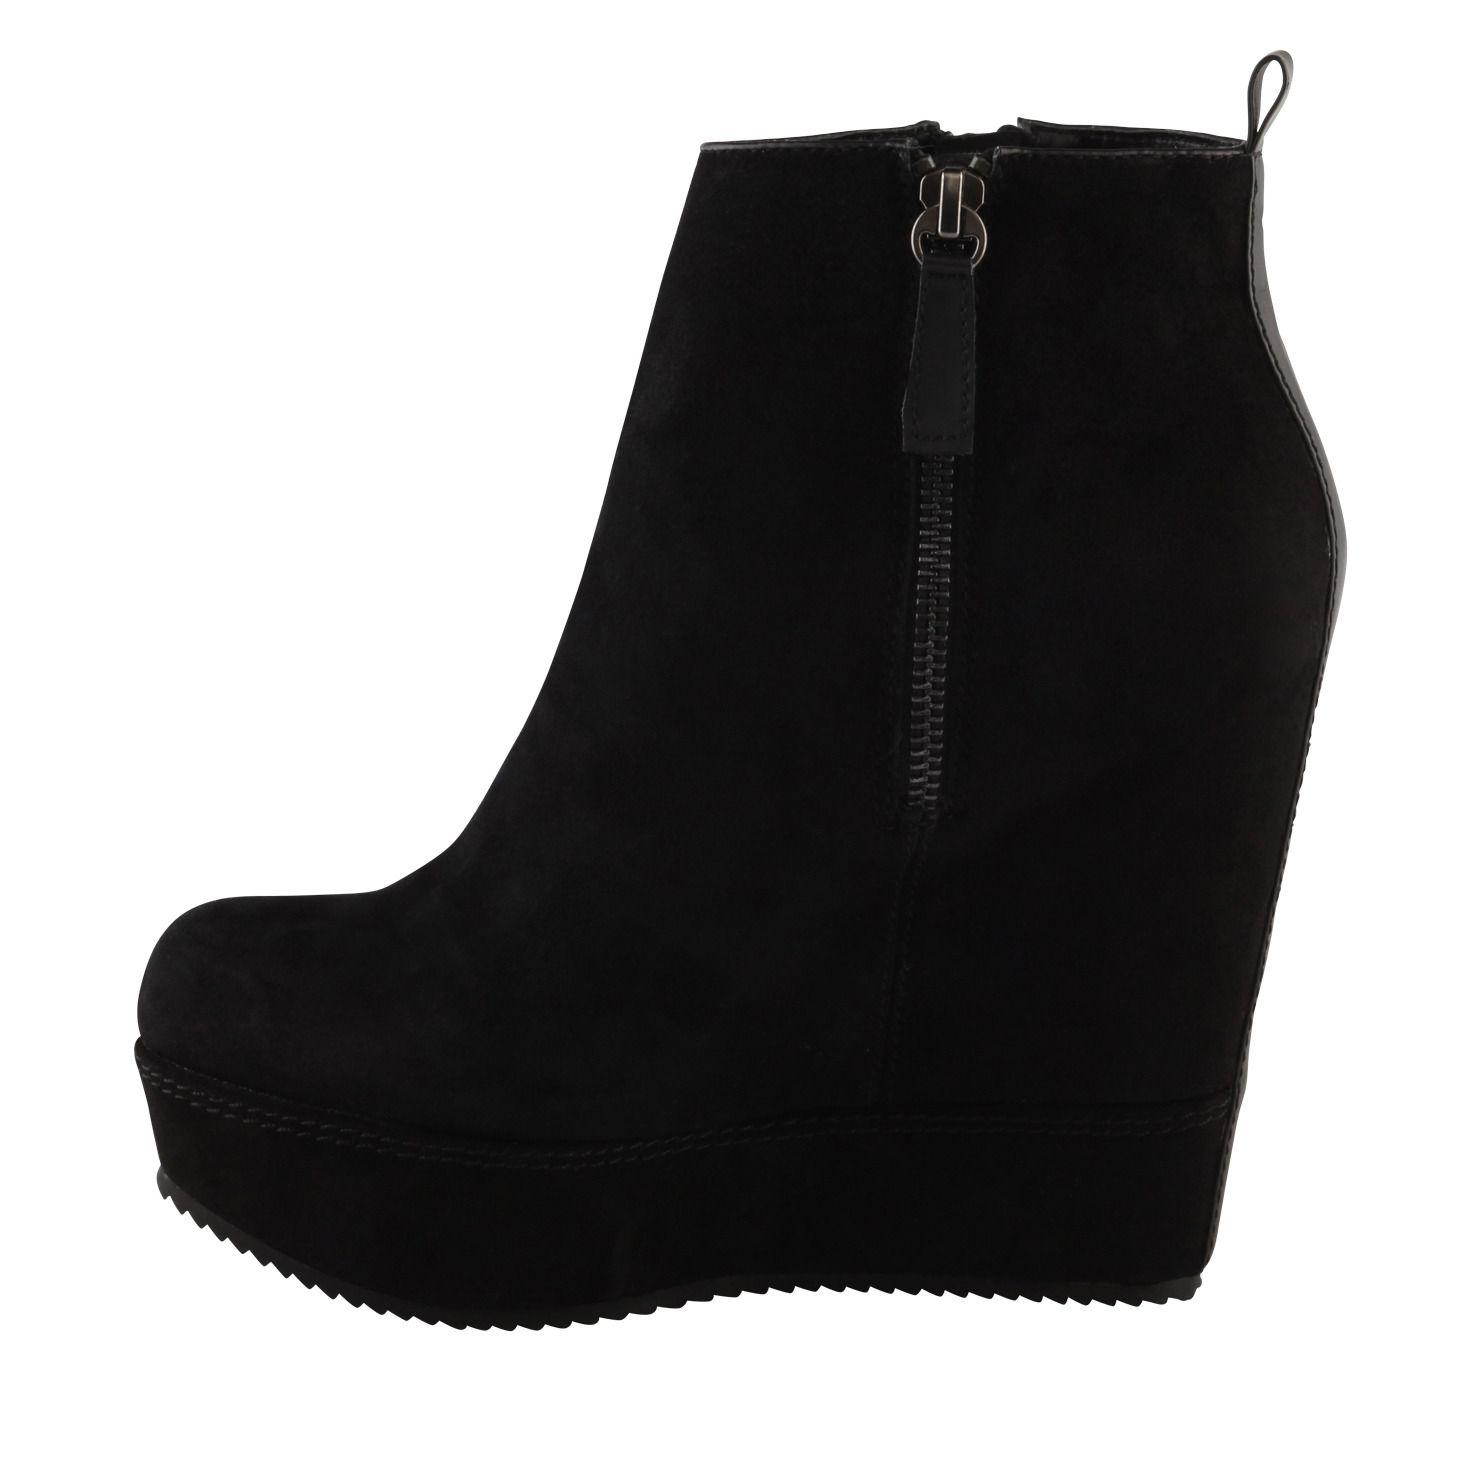 CECELIA - women's ankle boots boots for sale at ALDO Shoes.